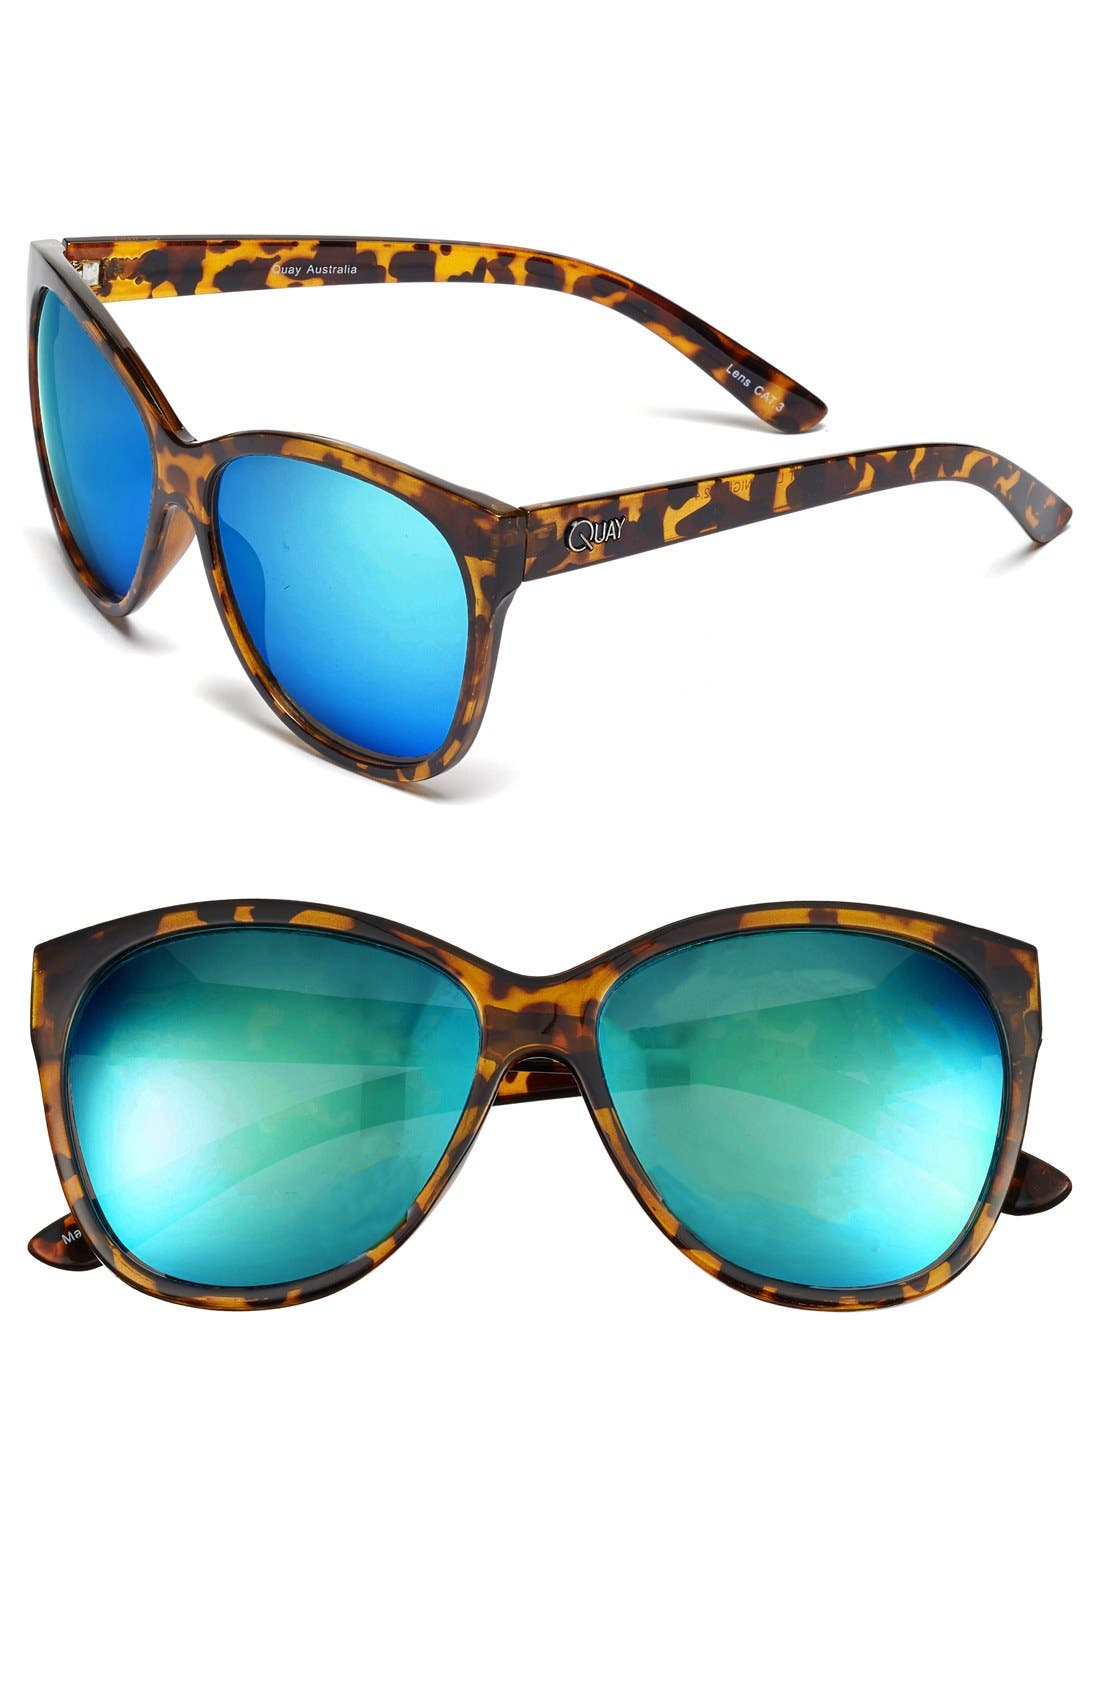 'About Last Night' 59mm Retro Sunglasses,                             Main thumbnail 1, color,                             210